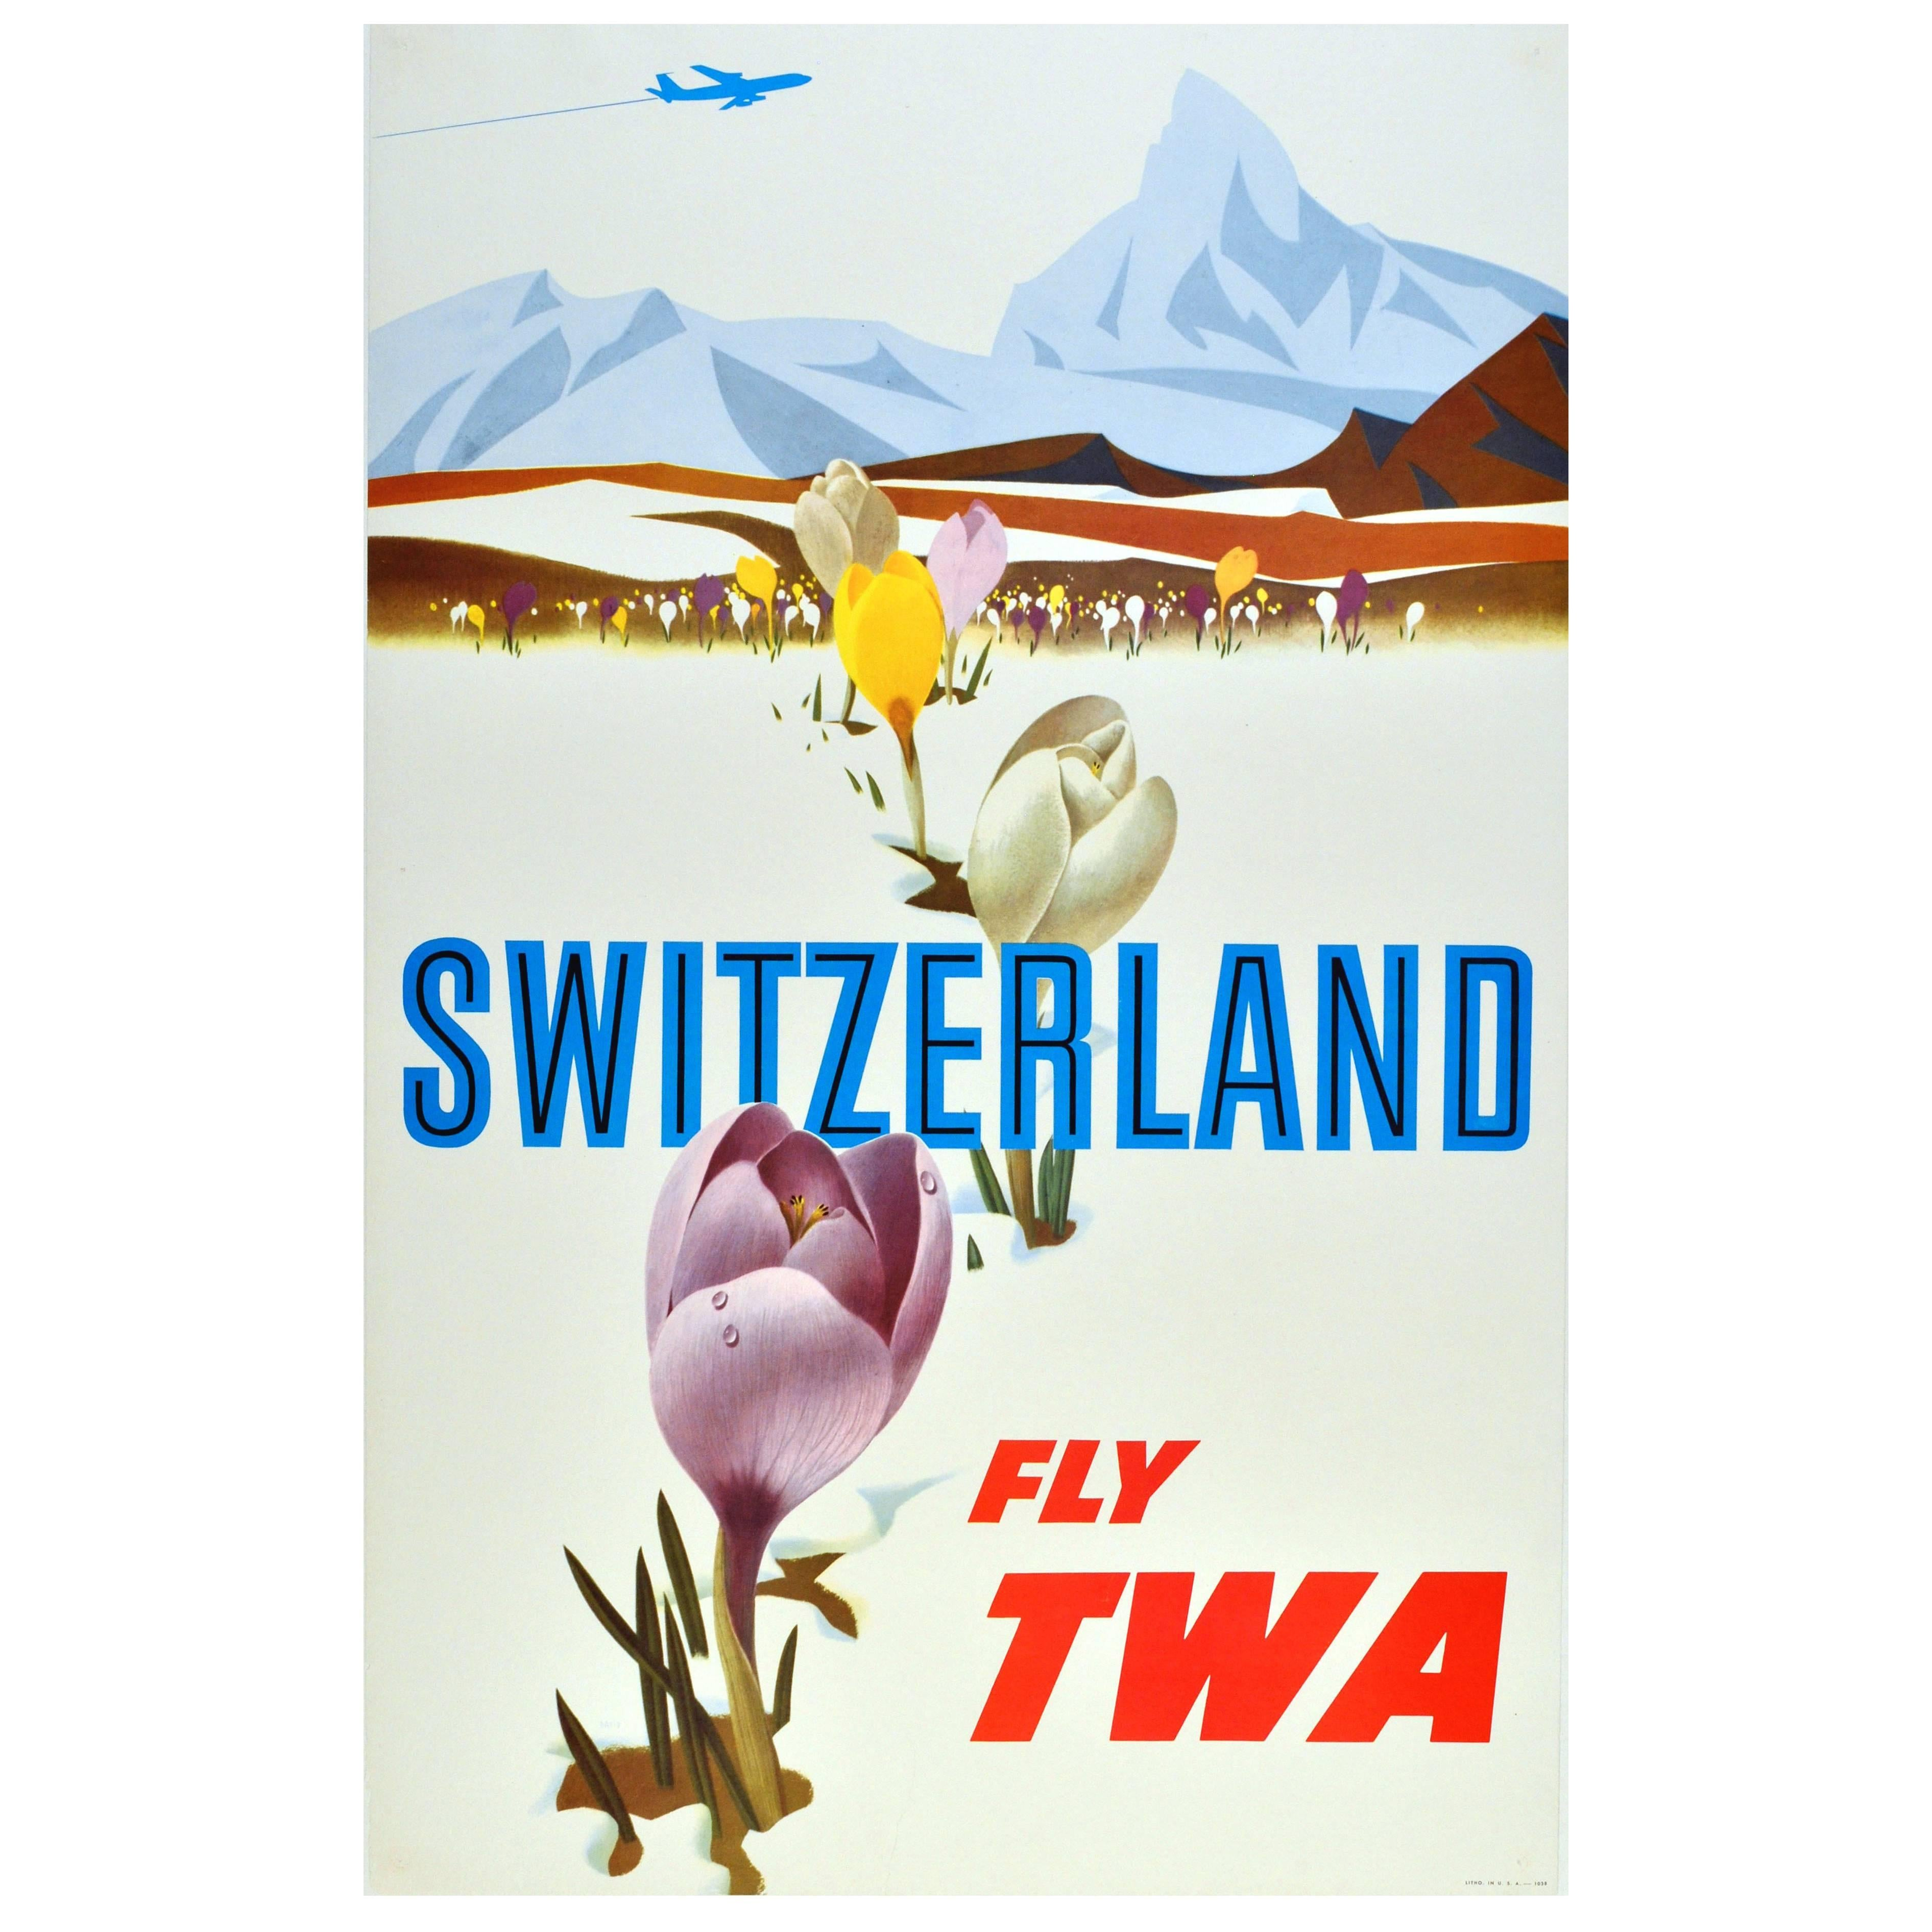 Original Vintage Travel Advertising Poster by David Klein, Switzerland Fly TWA